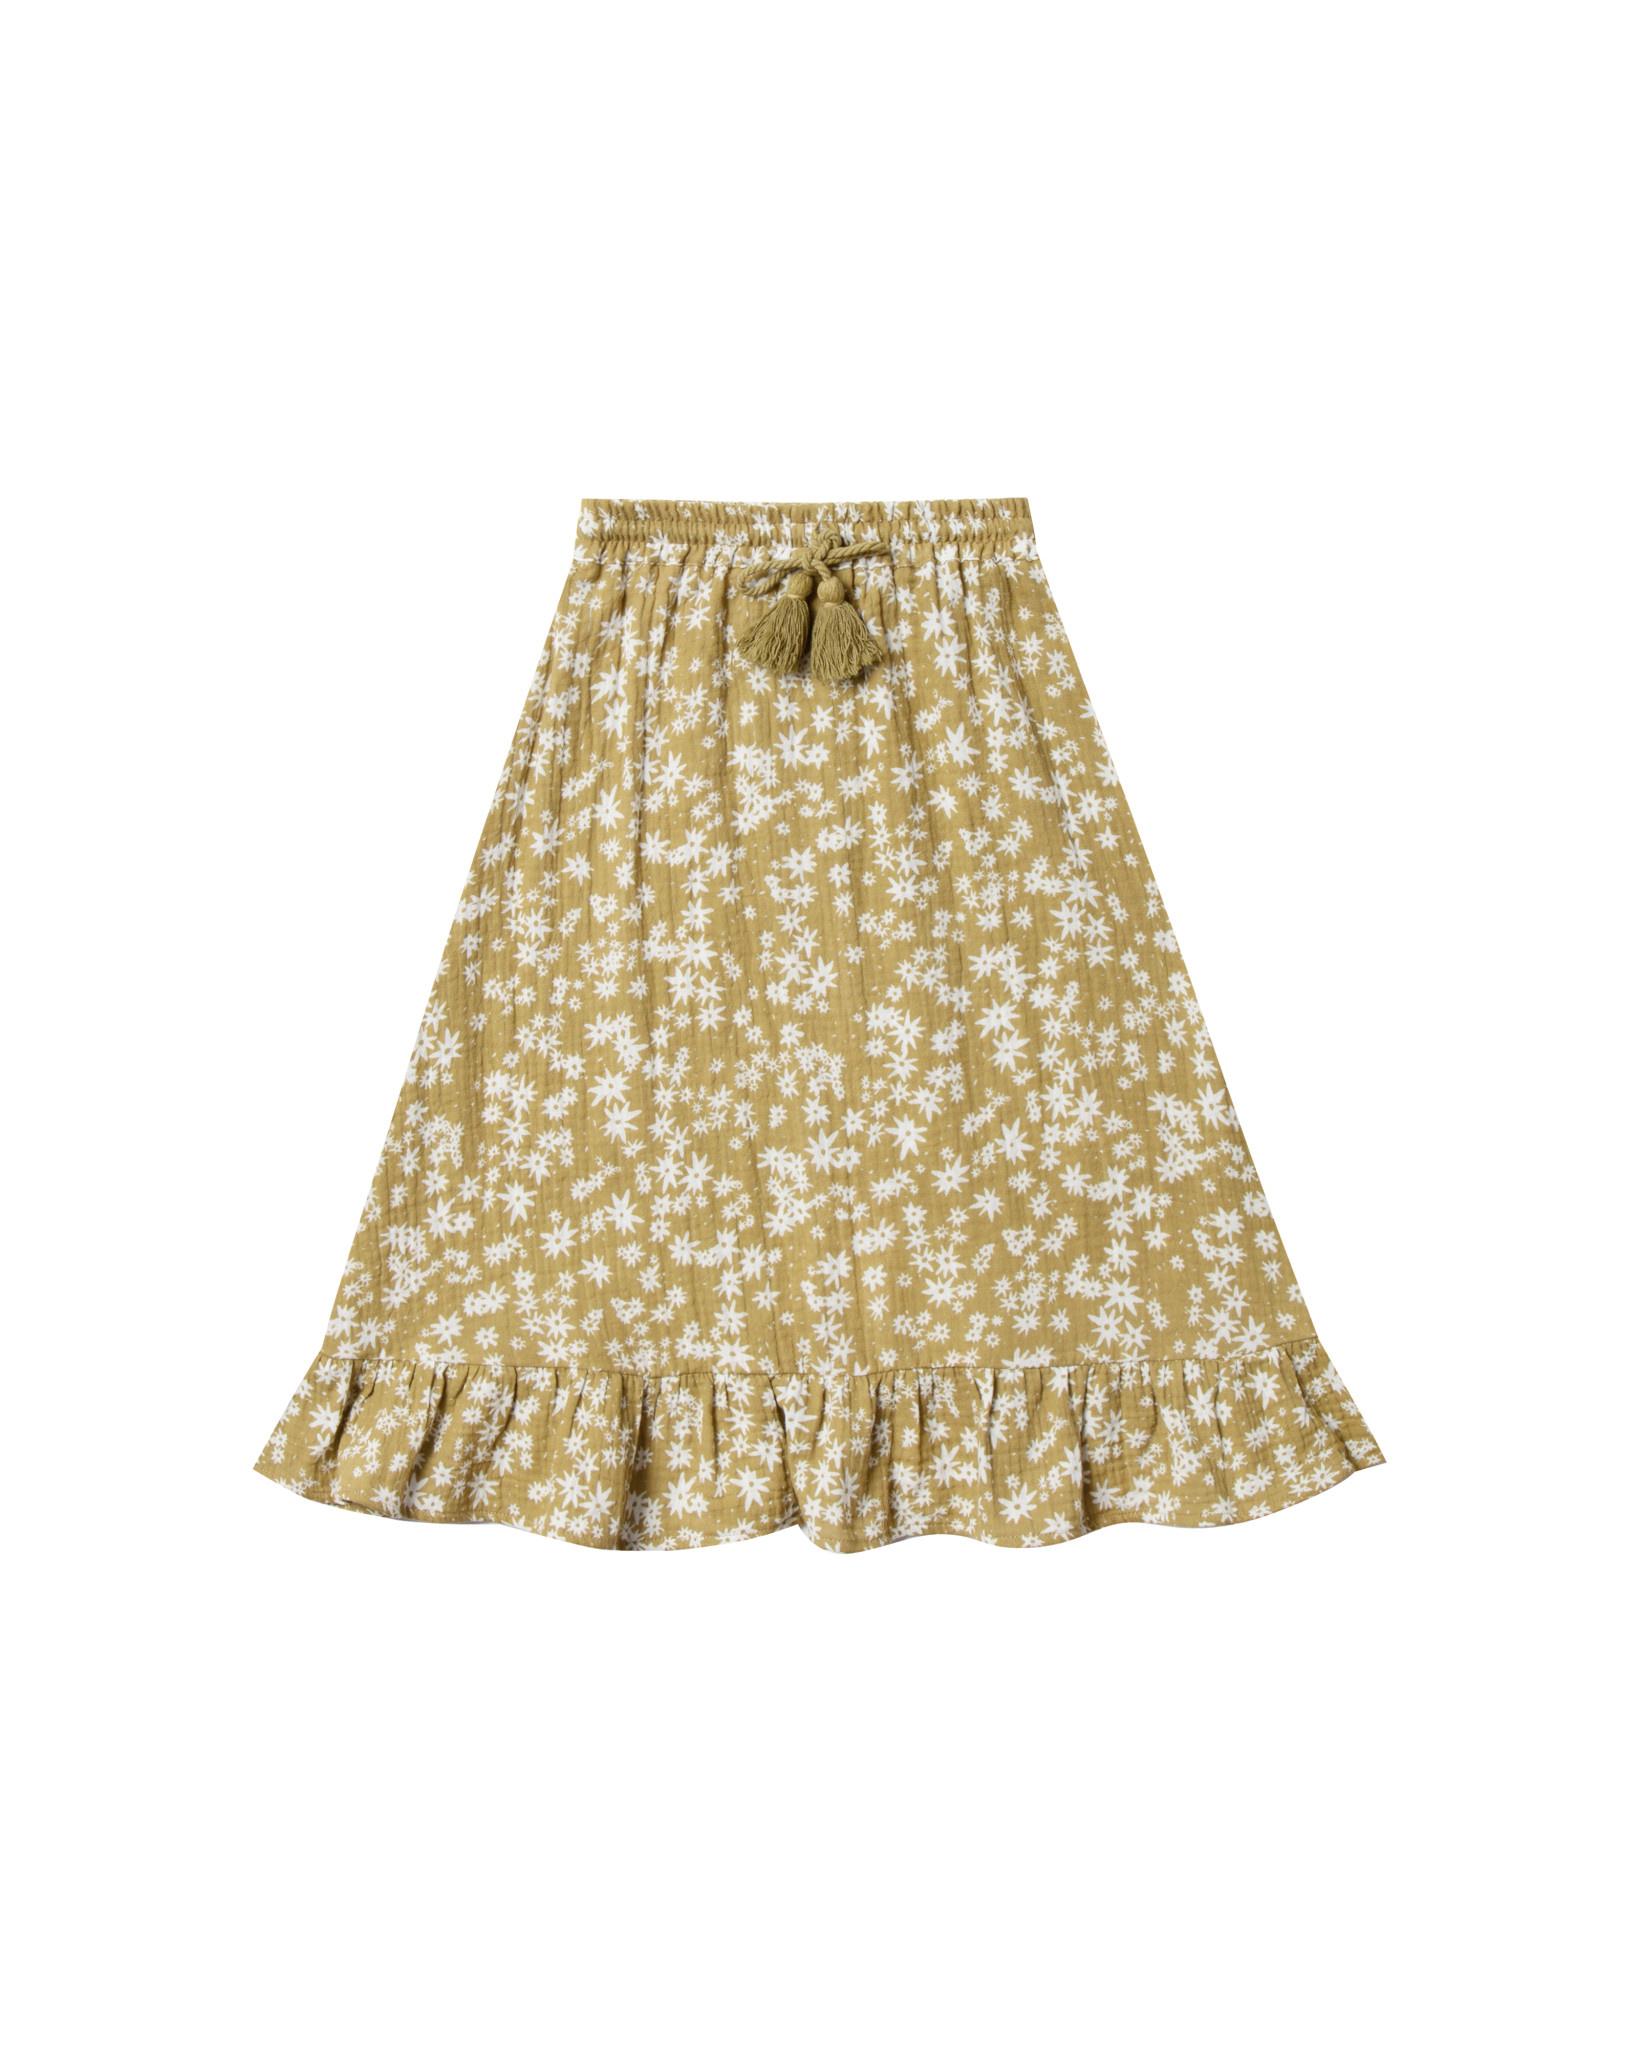 Rylee & Cru Midi Skirt